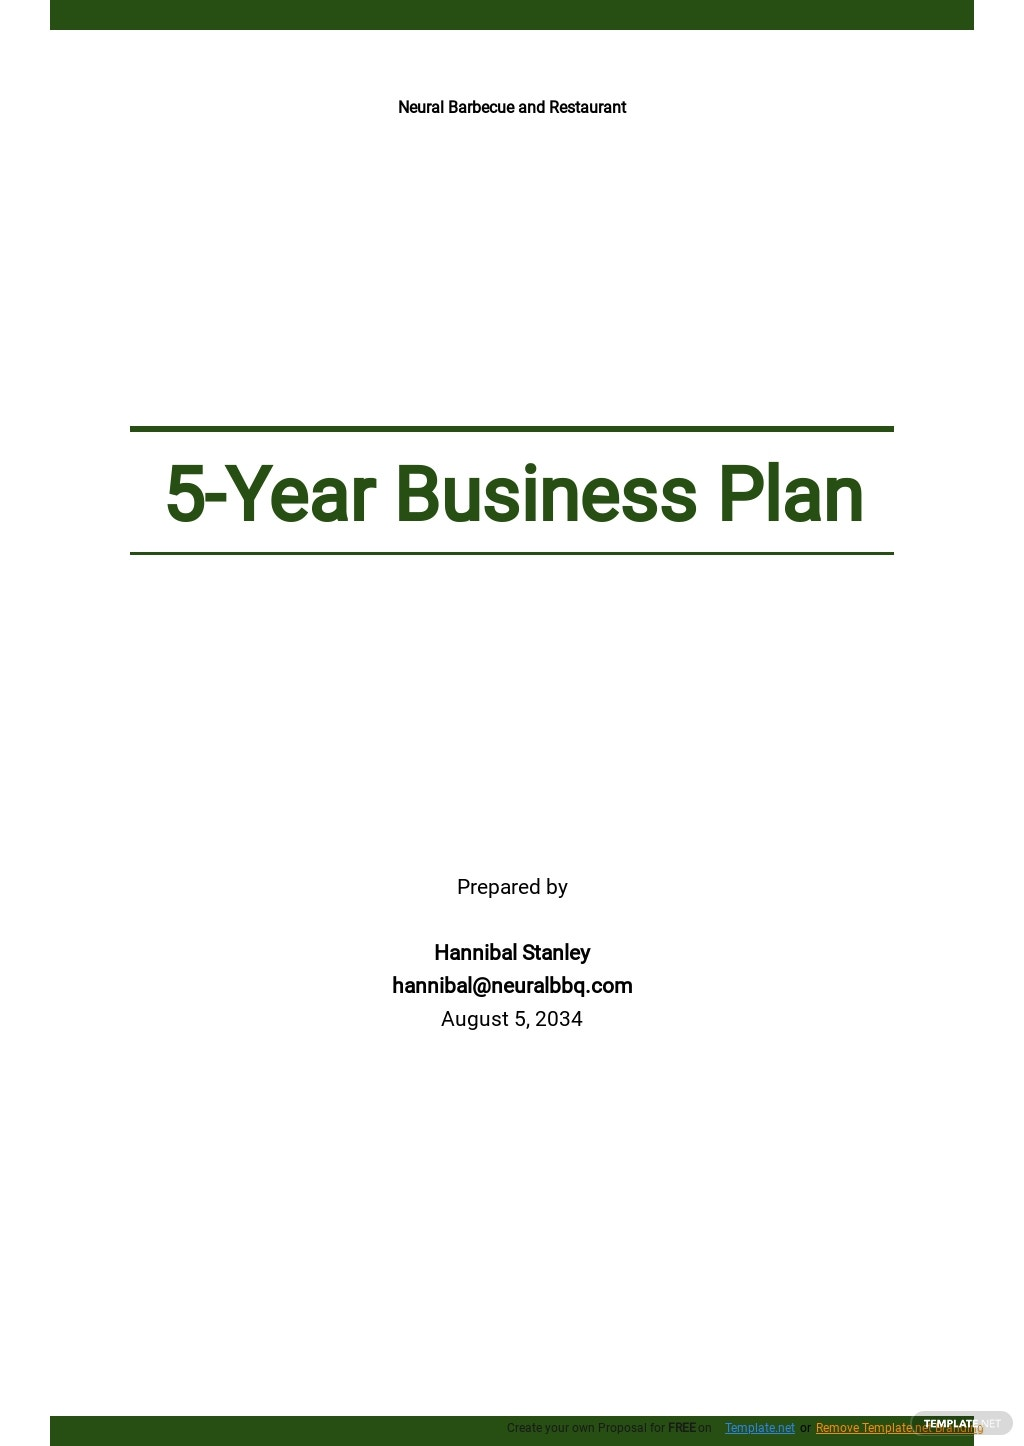 Sample 5 Year Business Plan Template.jpe